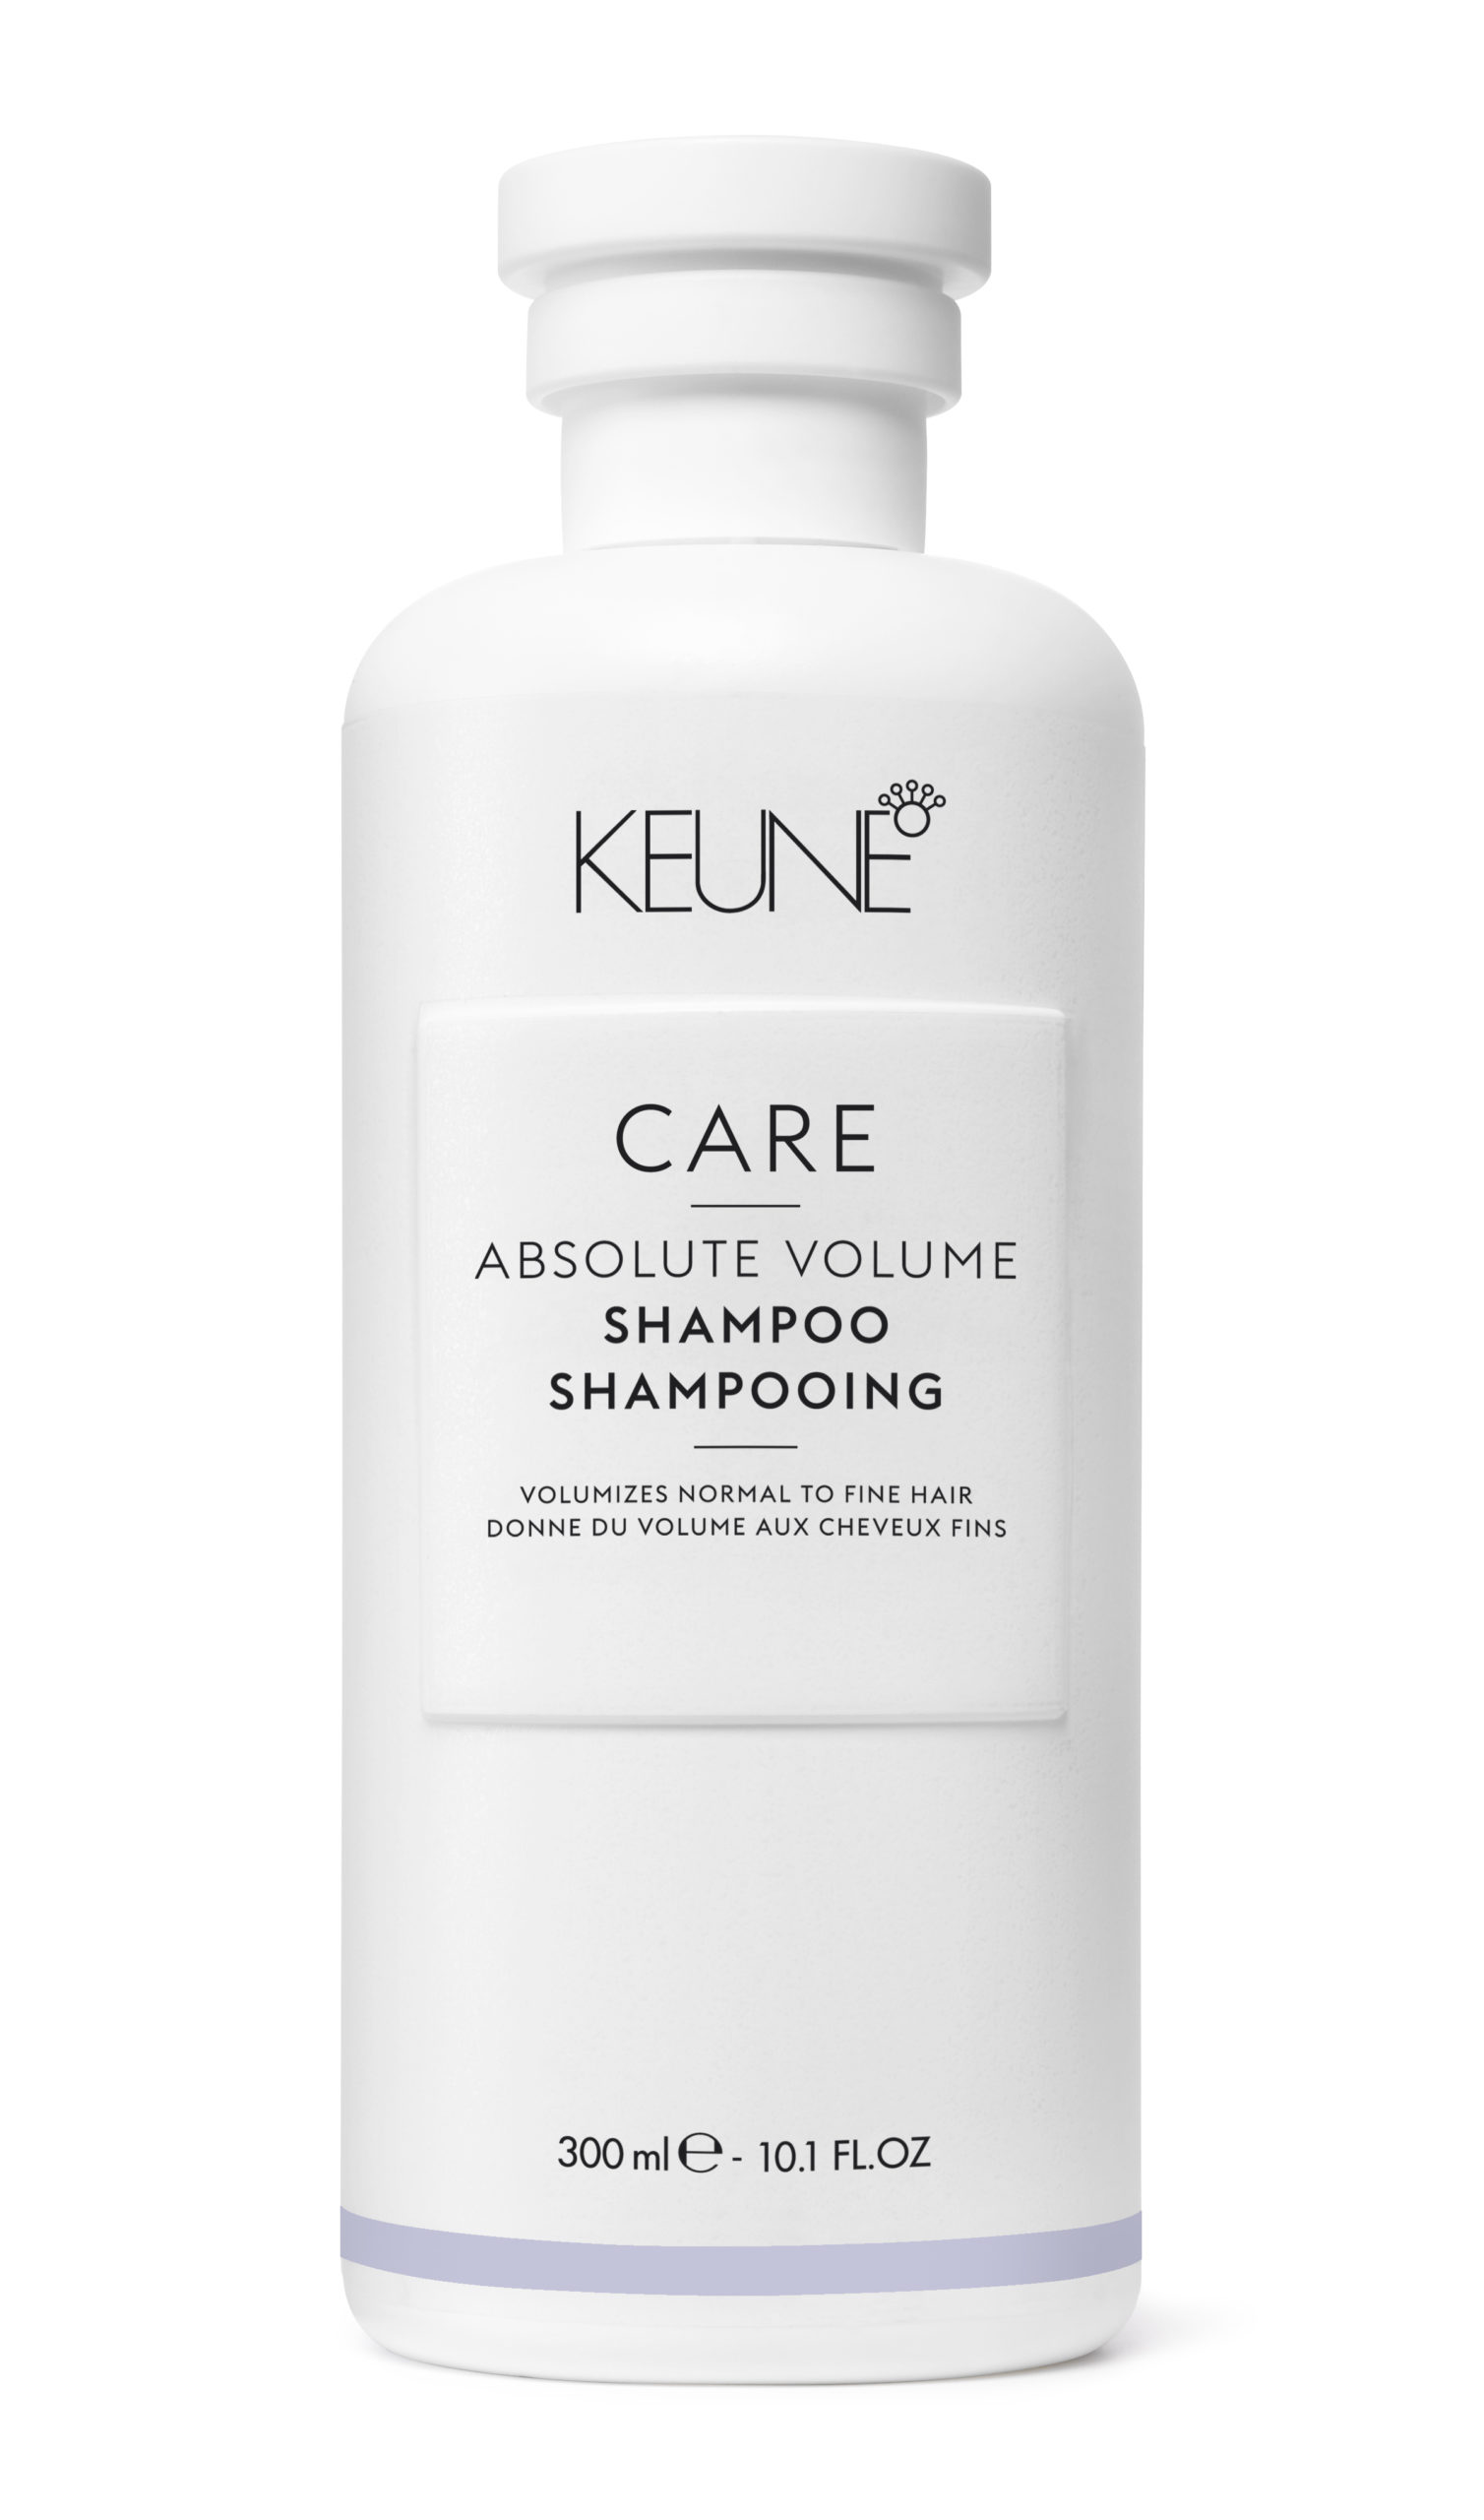 Care-Absolute-Volume-Shampoo-300ml-def-highres